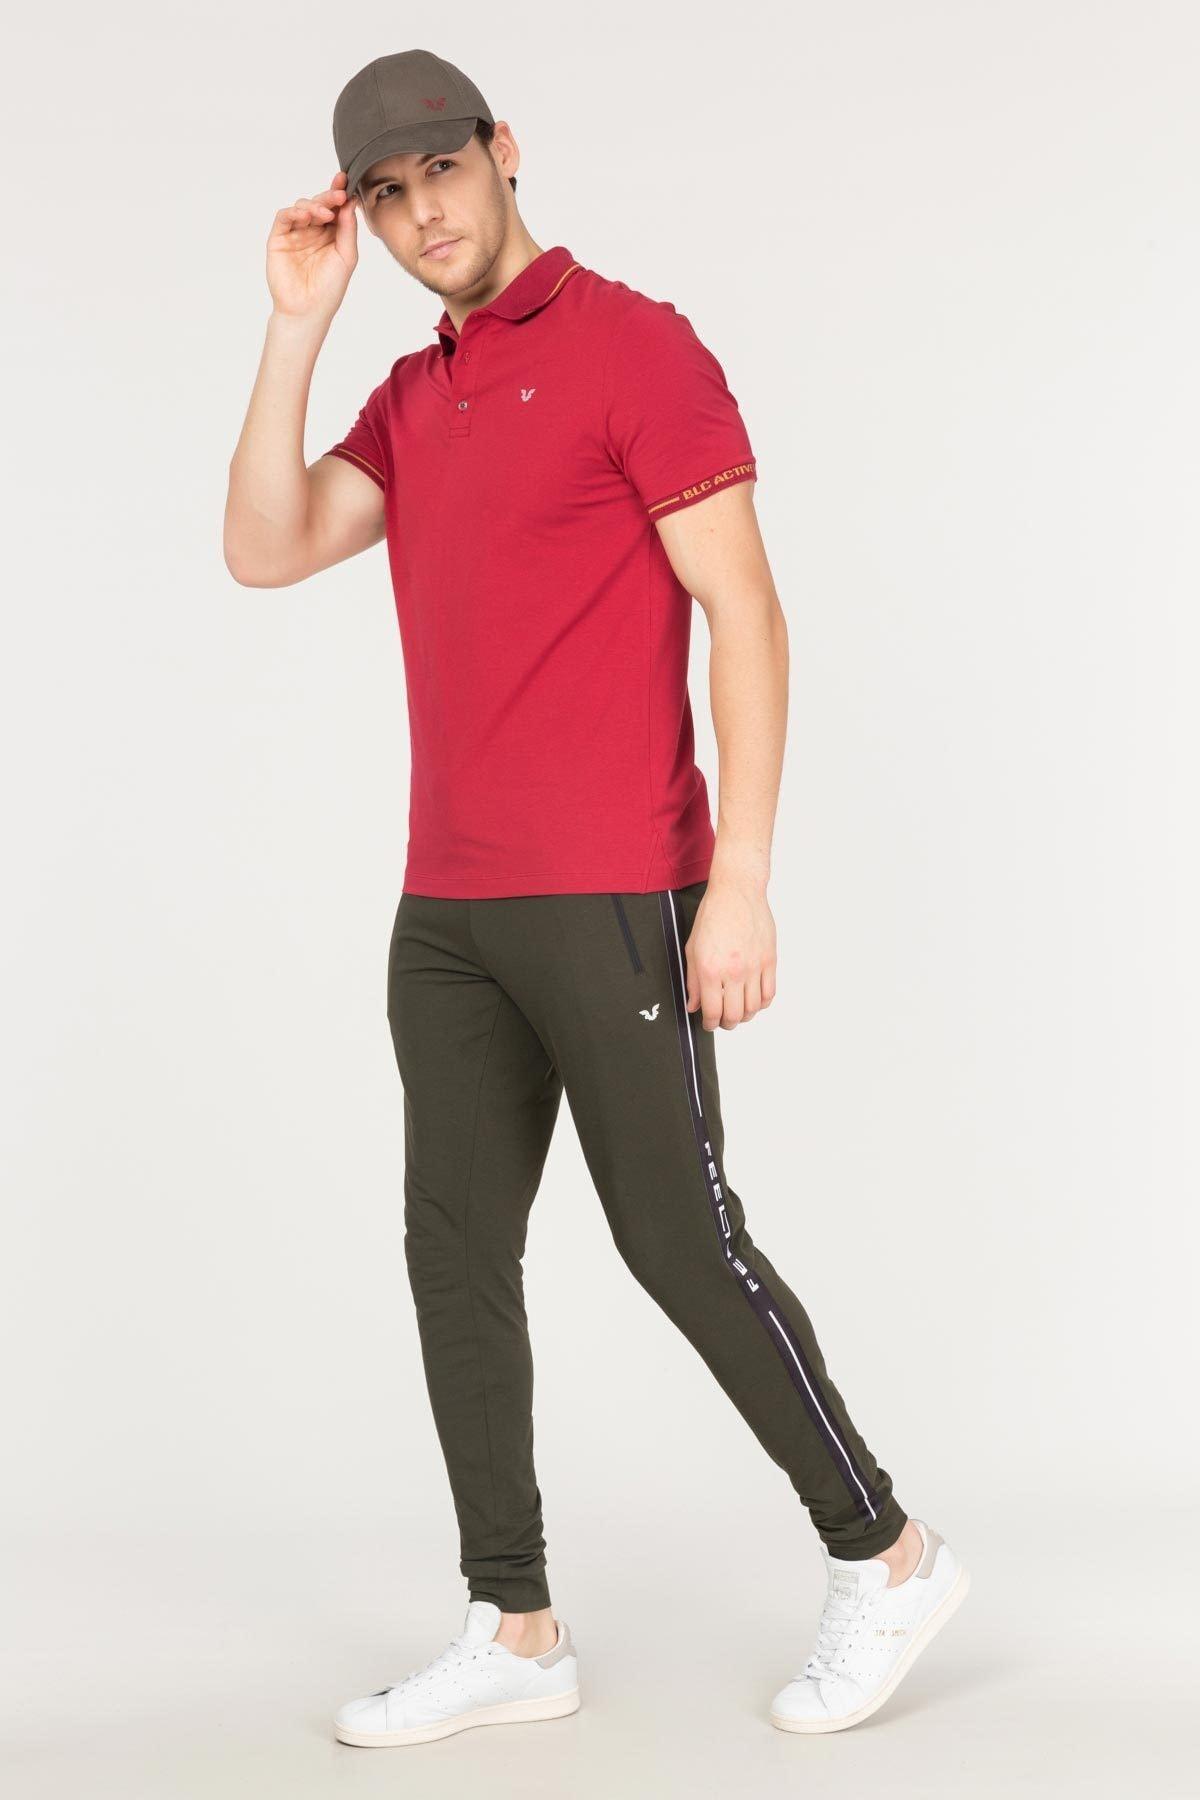 bilcee Bordo Polo Yaka Pamuklu Erkek T-Shirt FS-1759 1